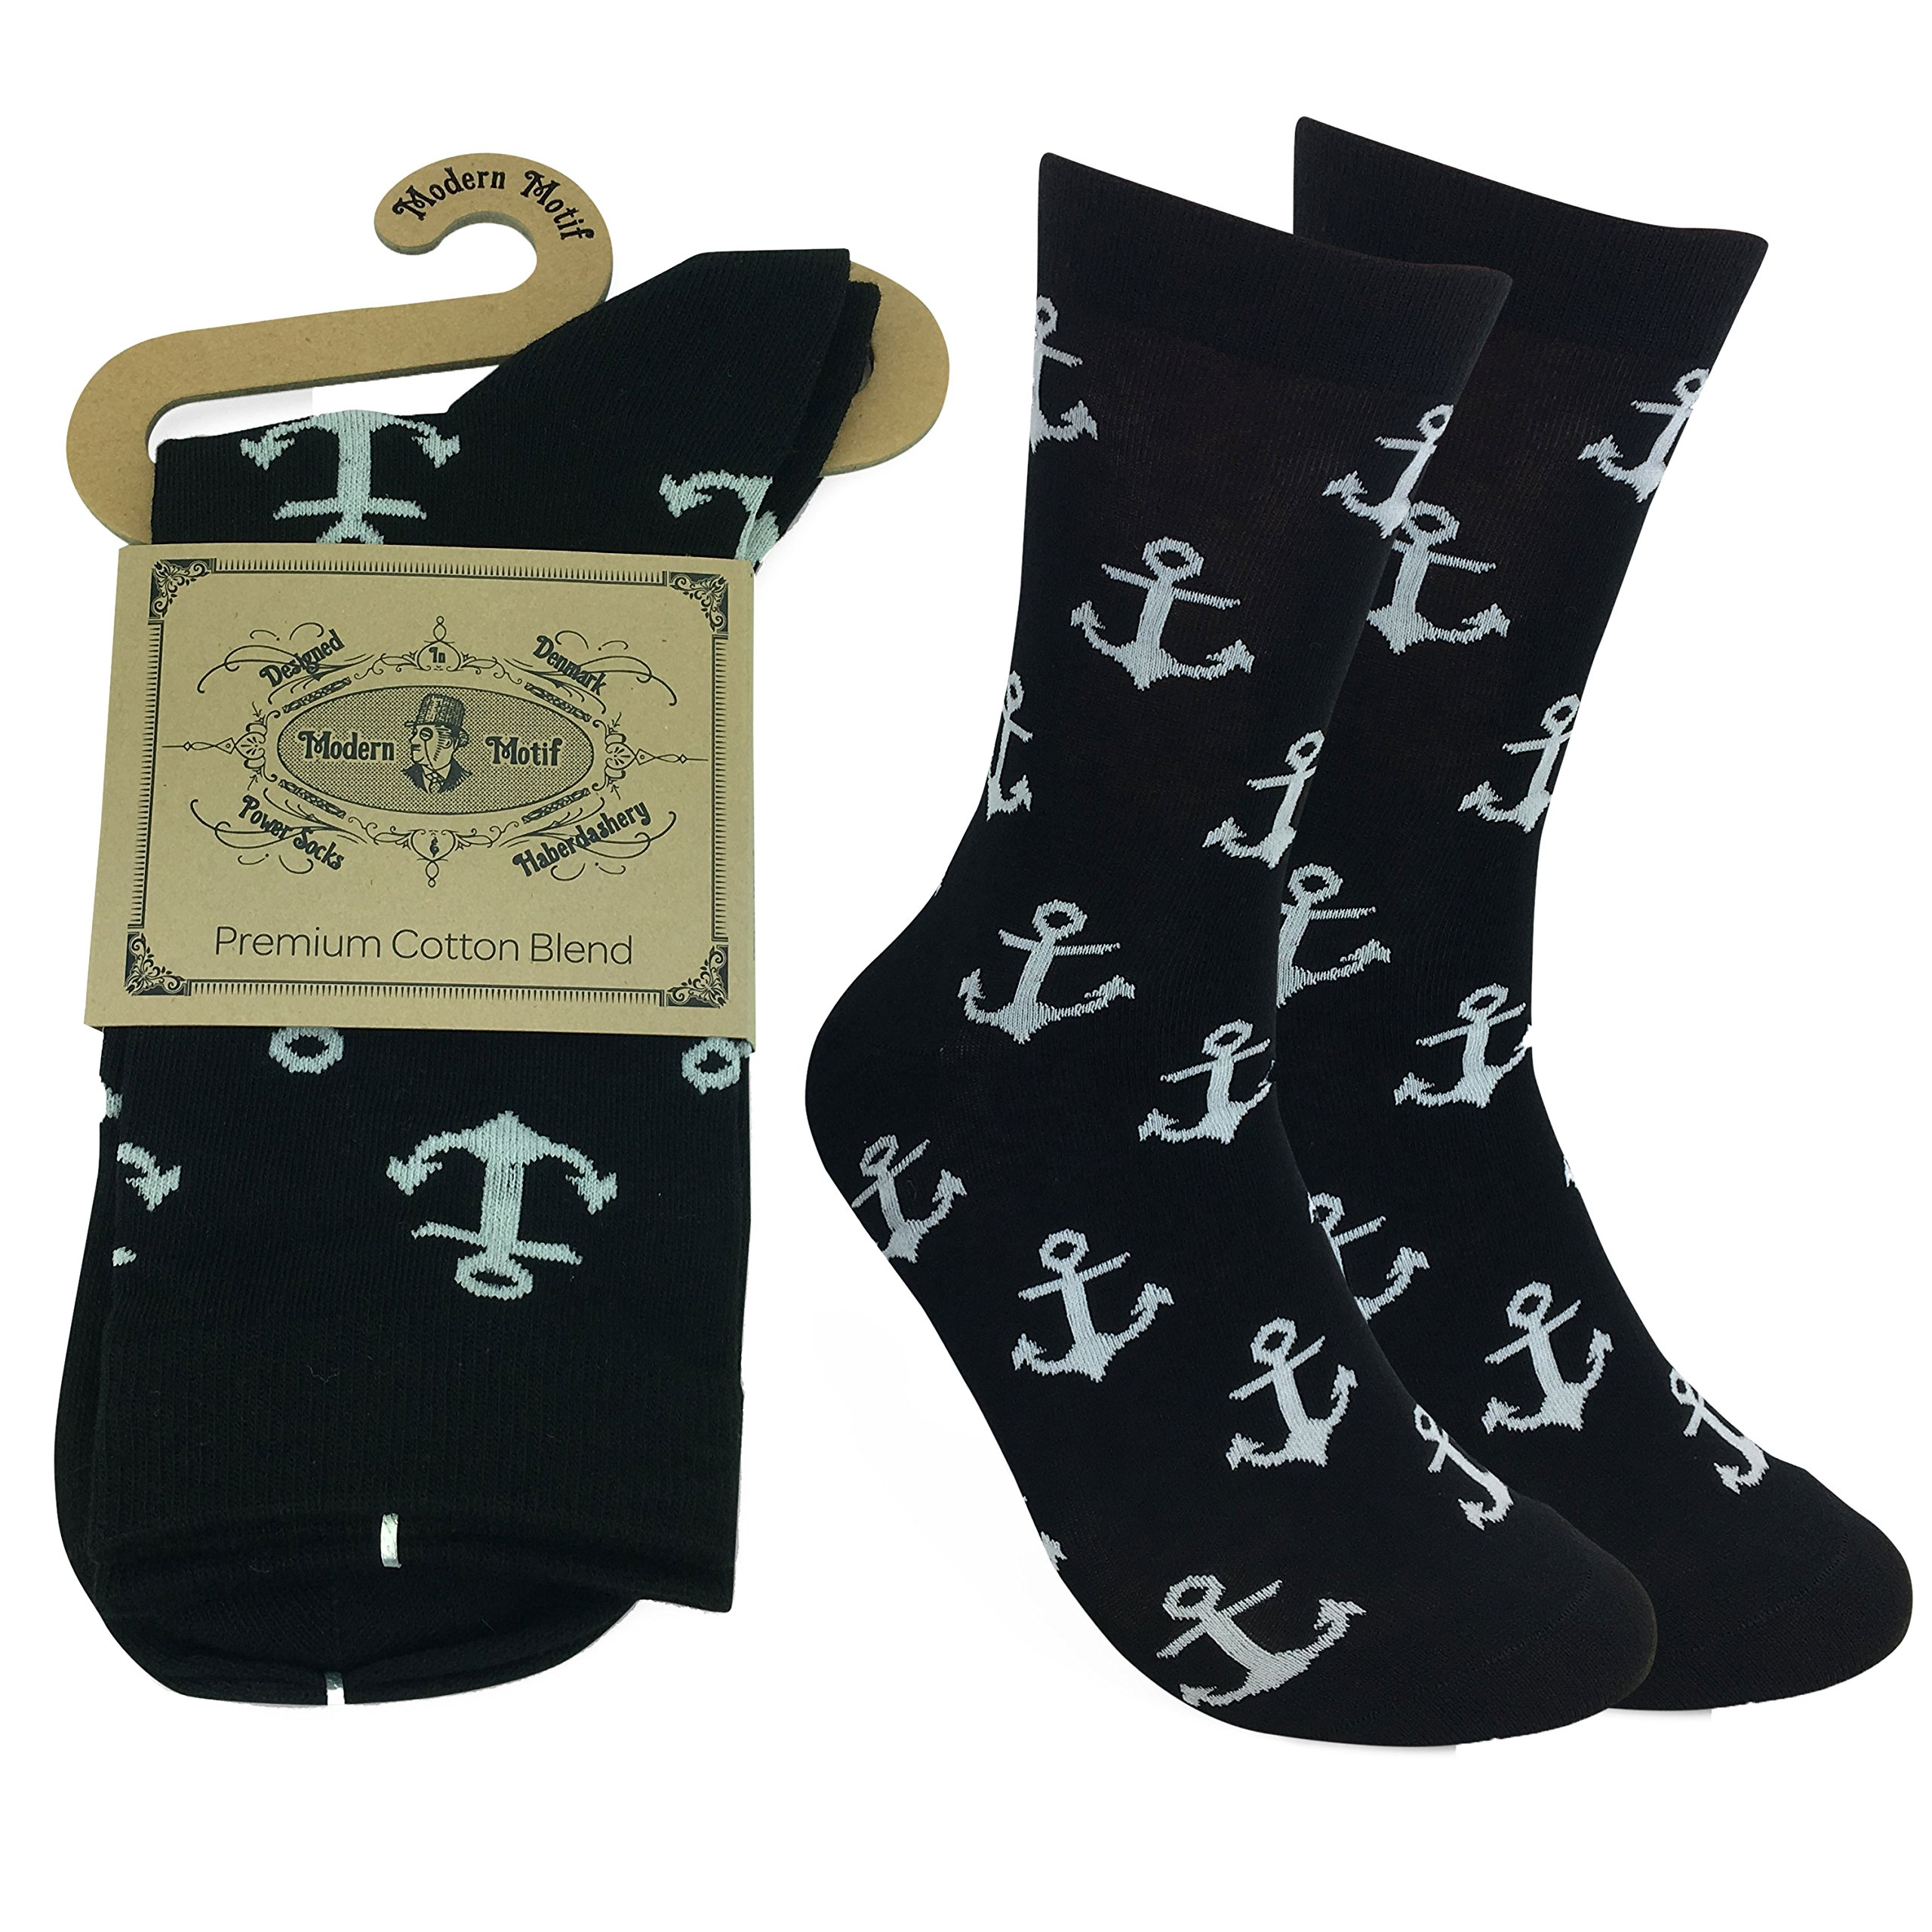 Full Black Anchor Style Men Brand Funky Socks Fashion Business Men's Socks Cotton Multi Color Male Classic Socks